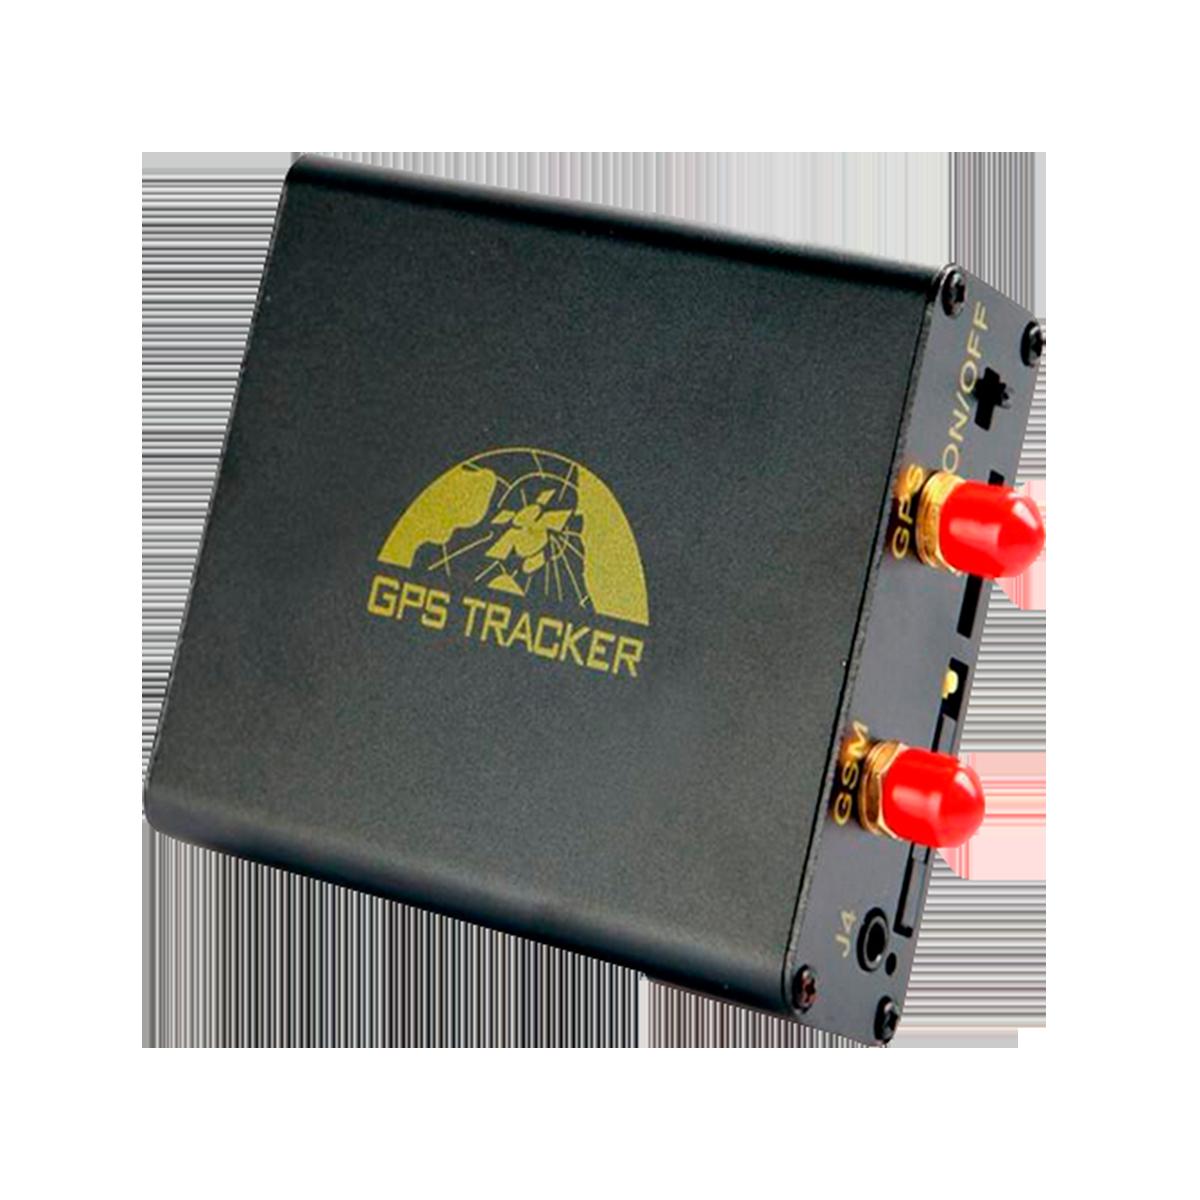 GPS Tracker - Localizador TK105, rastreo satelital